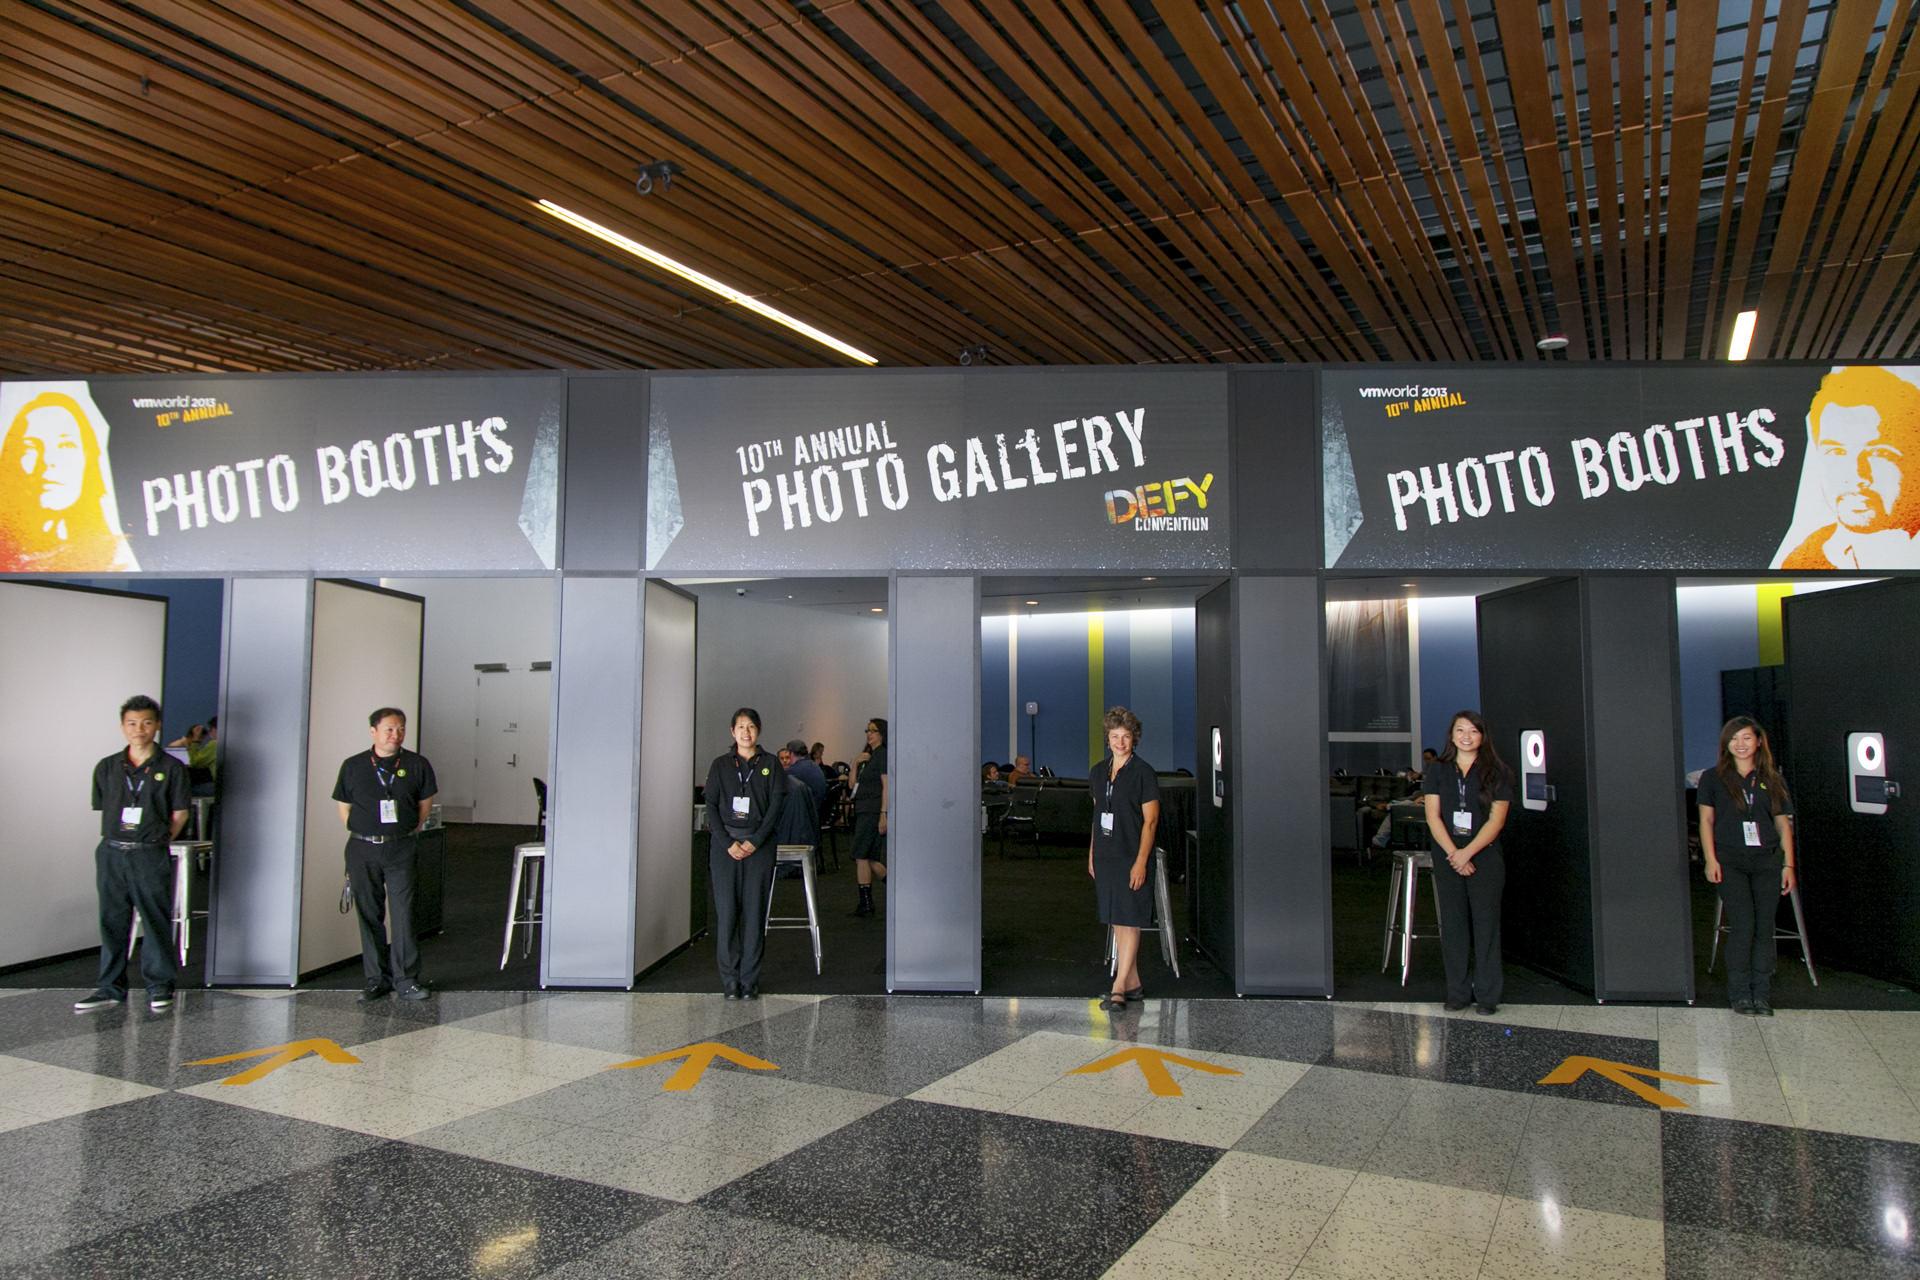 VMWorld Photo Booths